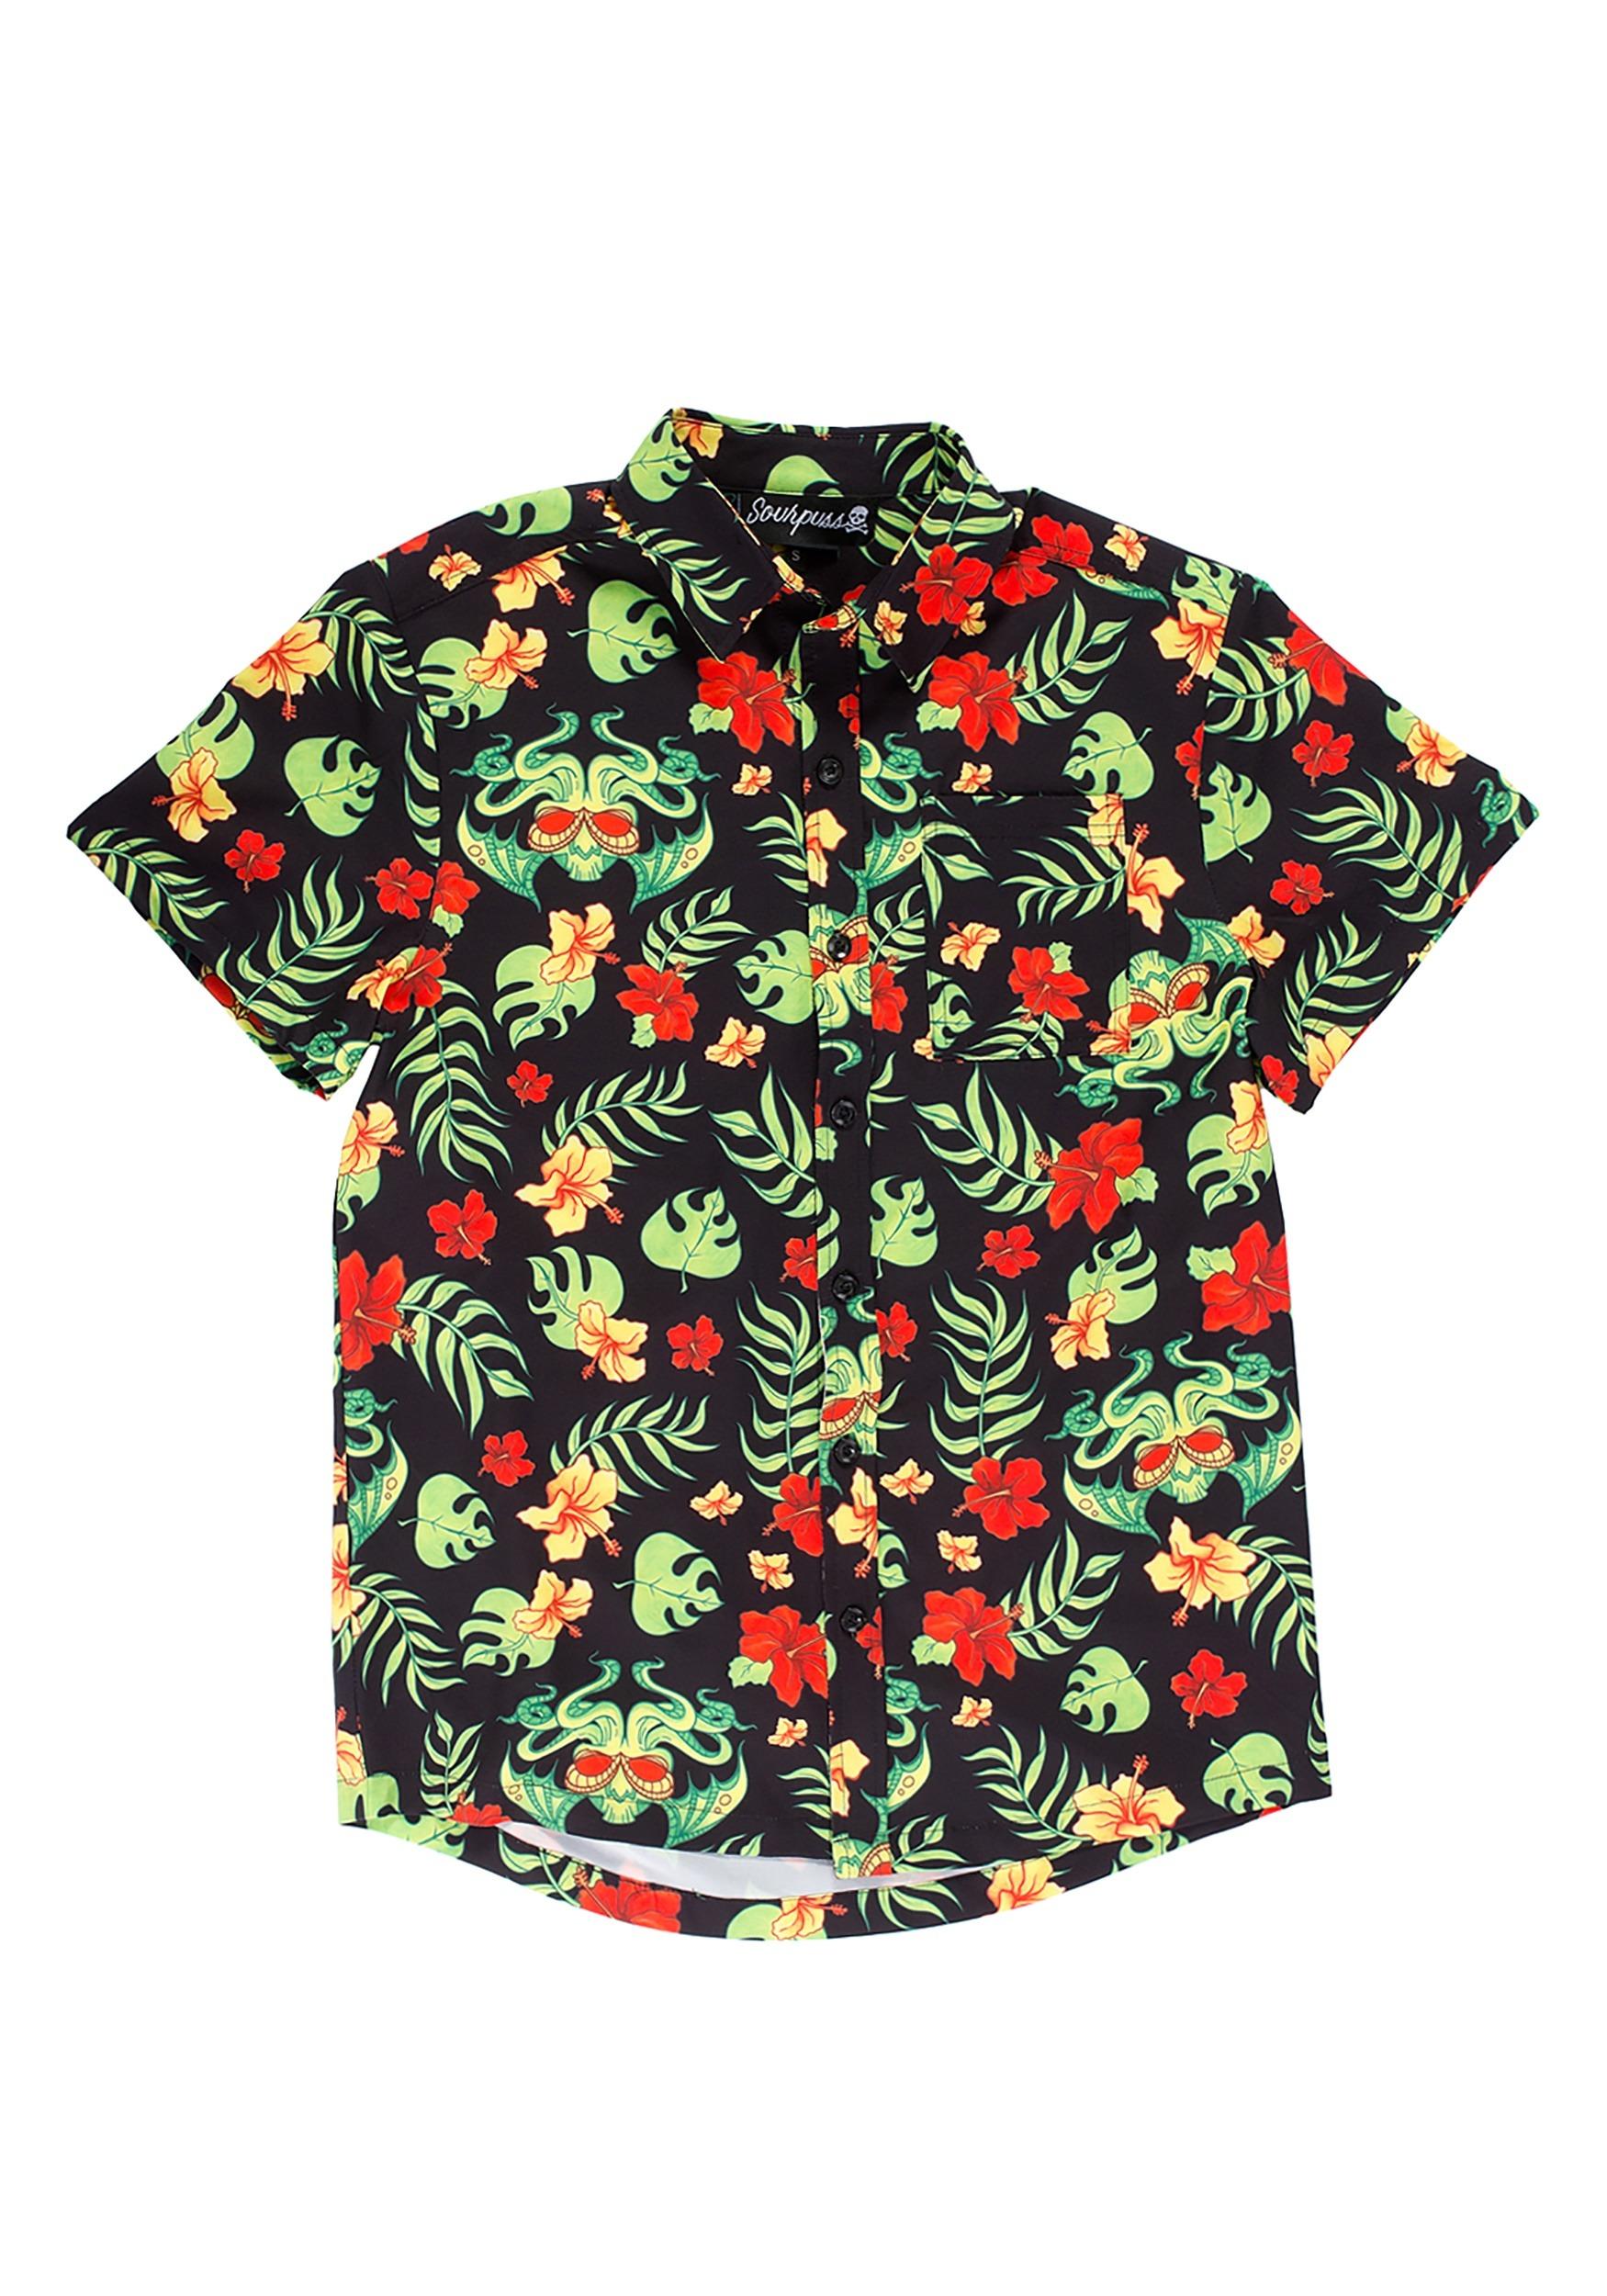 b7dc1016e Men's Casual Hawaiian Shirts & Tops for sale | eBay